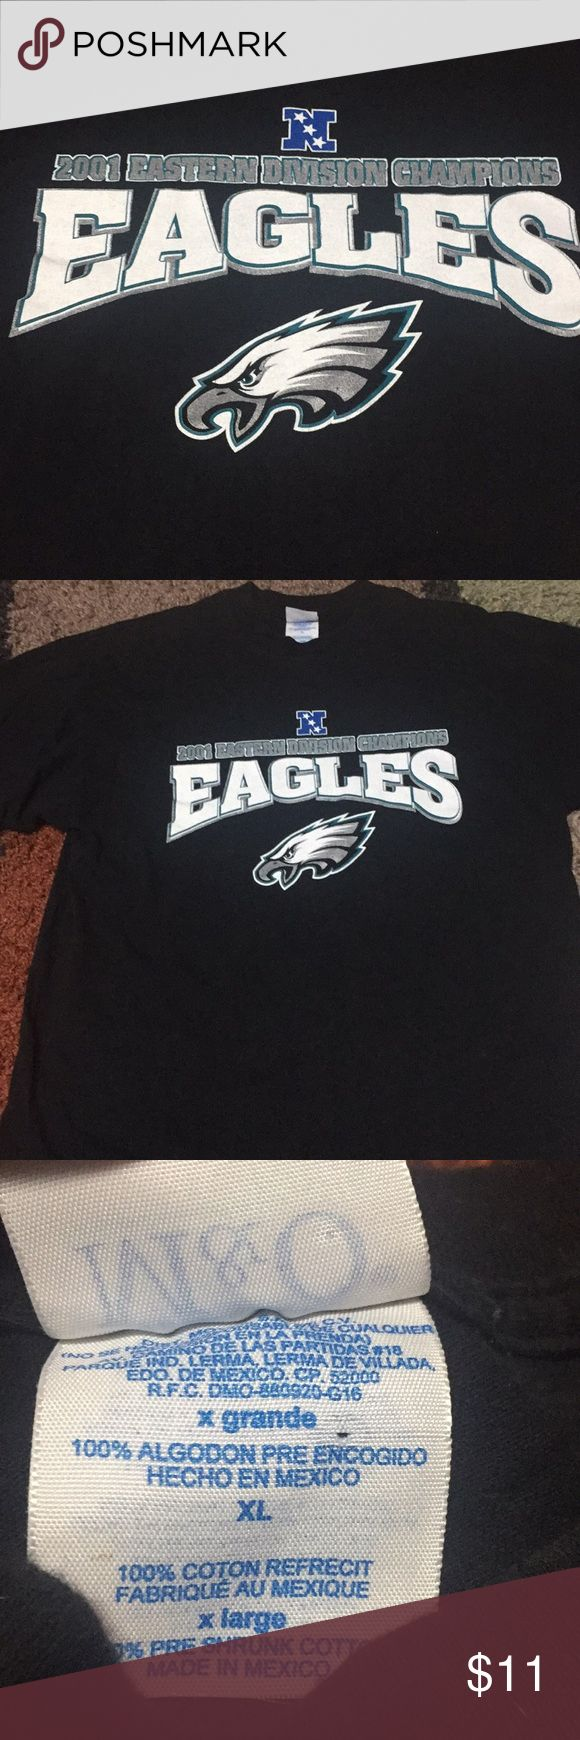 Philadelphia Eagles 2001 Division Champs T-shirt Black Division Champs T-shirt. No back detail. Shirts Tees - Short Sleeve